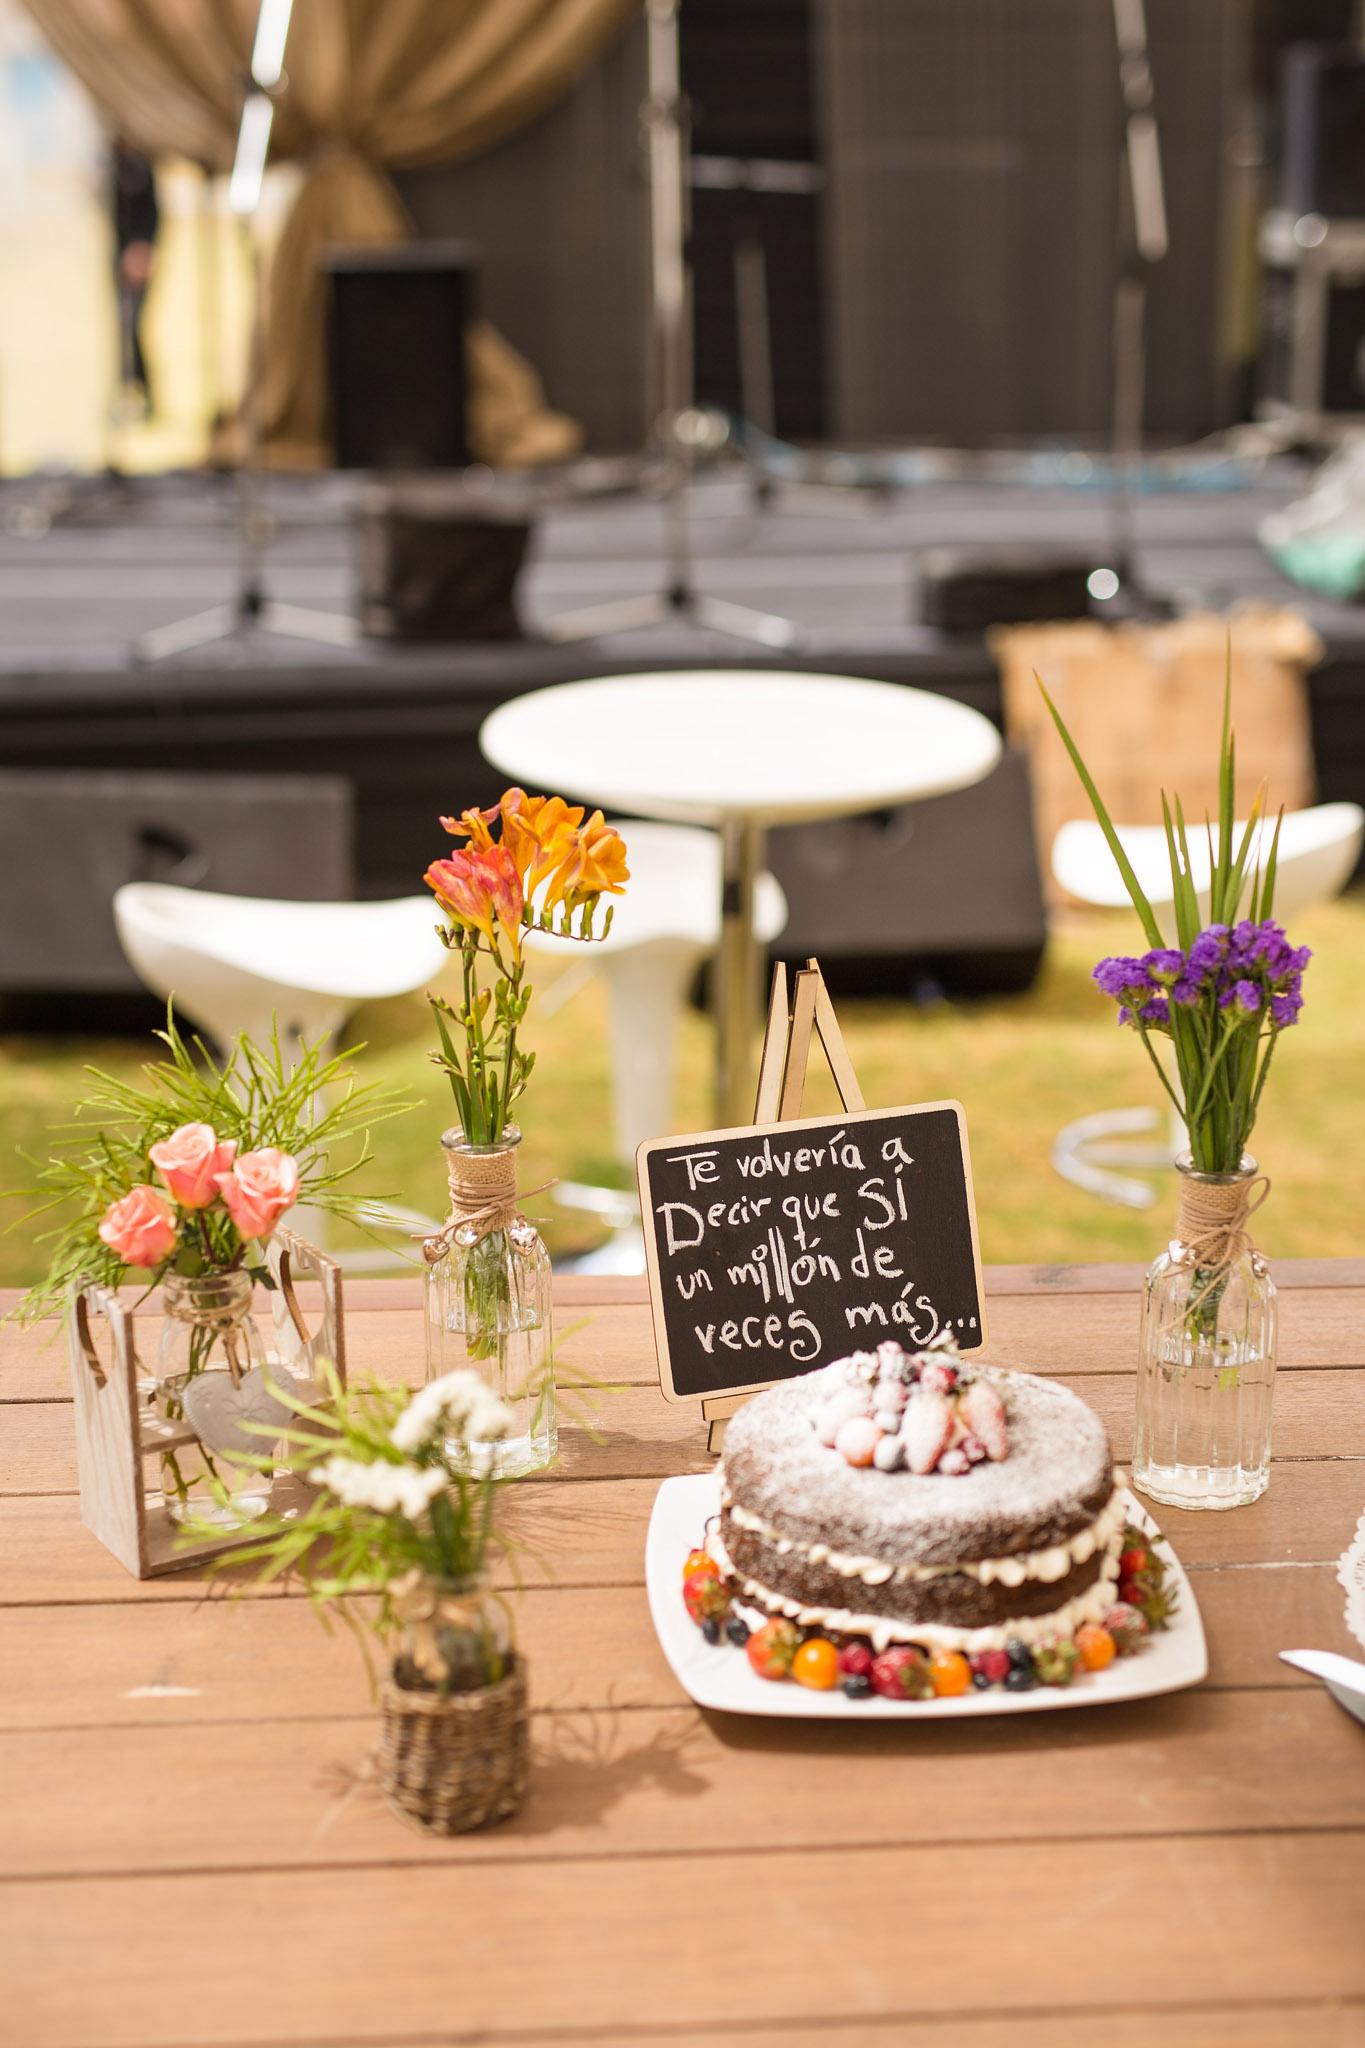 Wedding-Travellers-Destination-Wedding-Peru-Cusco-Hacienda-Sarapampa-Sacred-Valley-naked-cake-decoration-details-painting-flowers